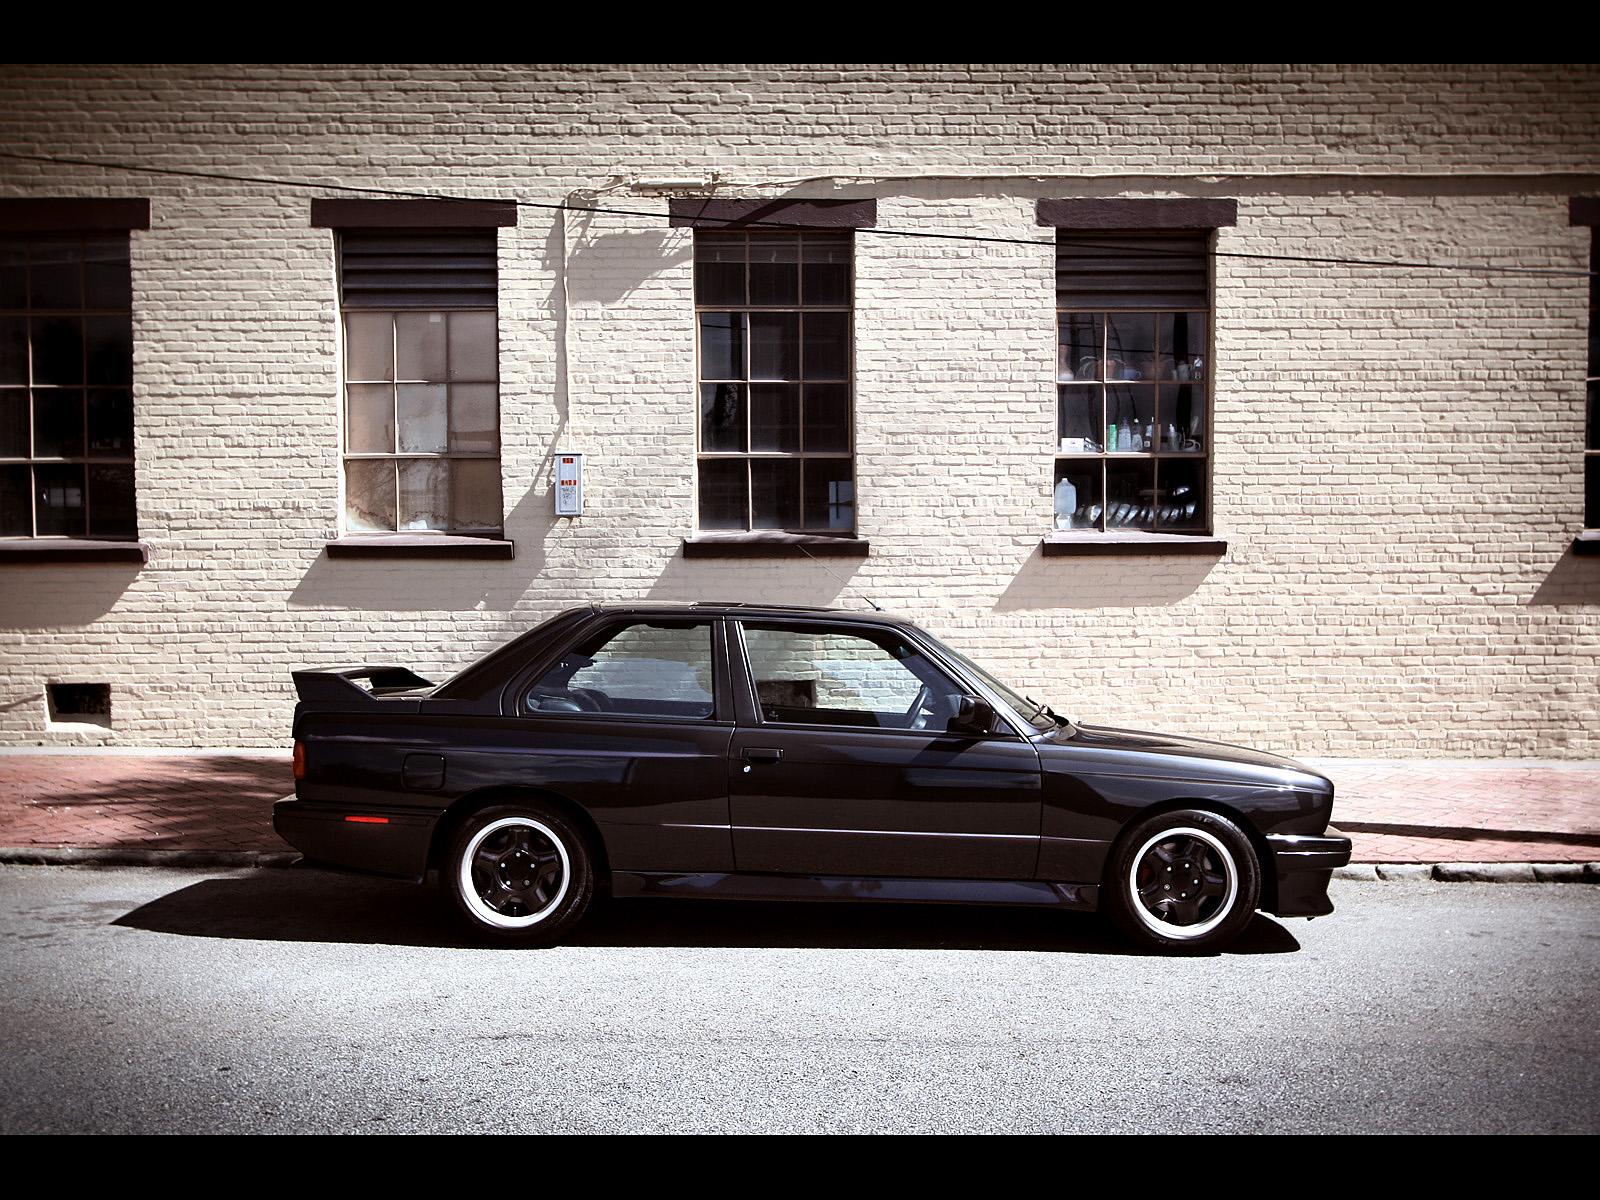 Bmw M3 E30 Photos Photogallery With 31 Pics Carsbase Com